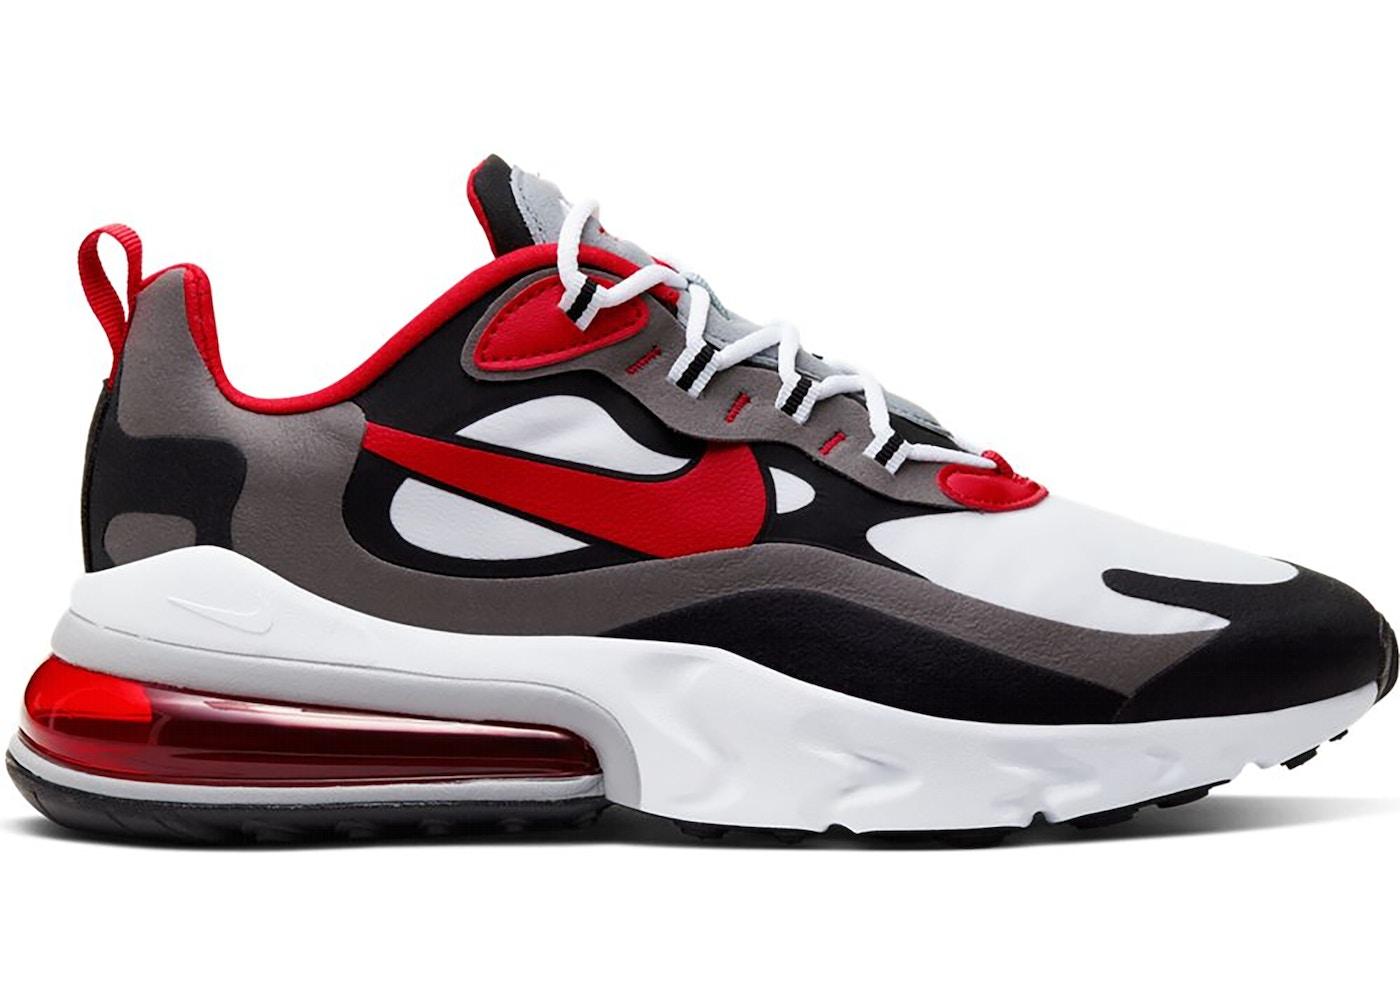 air max 270 react red white black